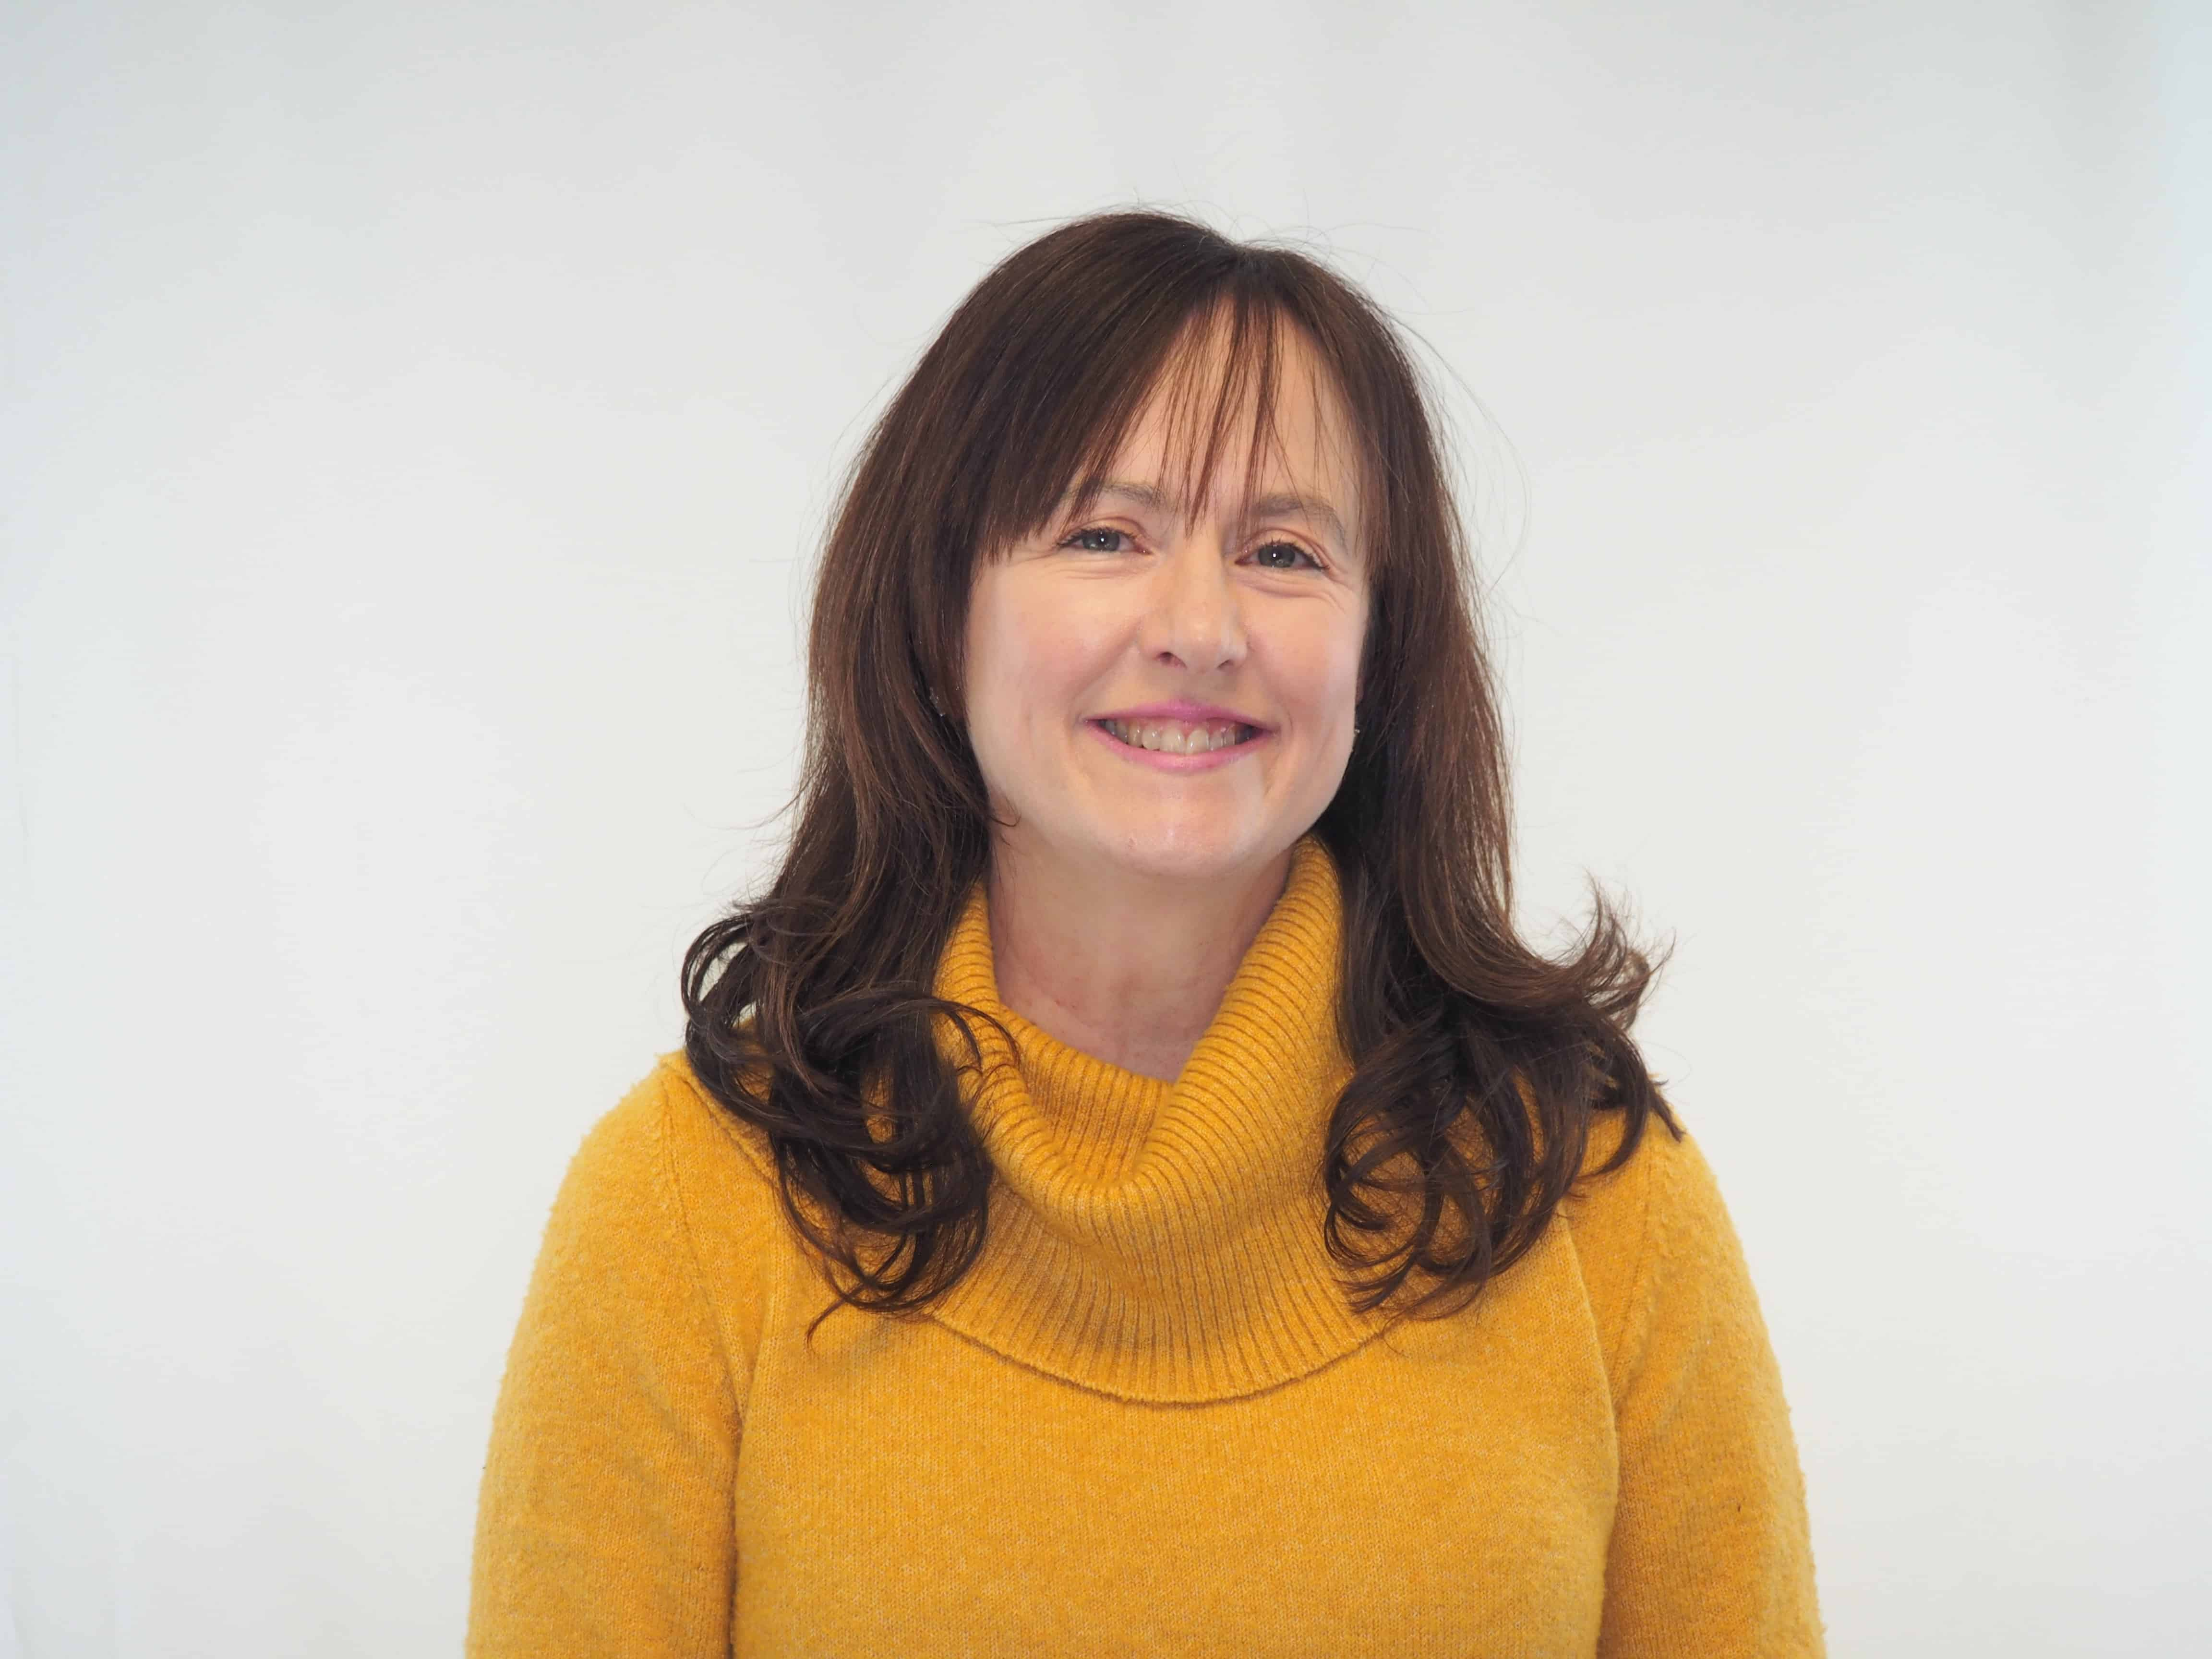 Kelly Newcomb, Vice President Strategic Initiatives